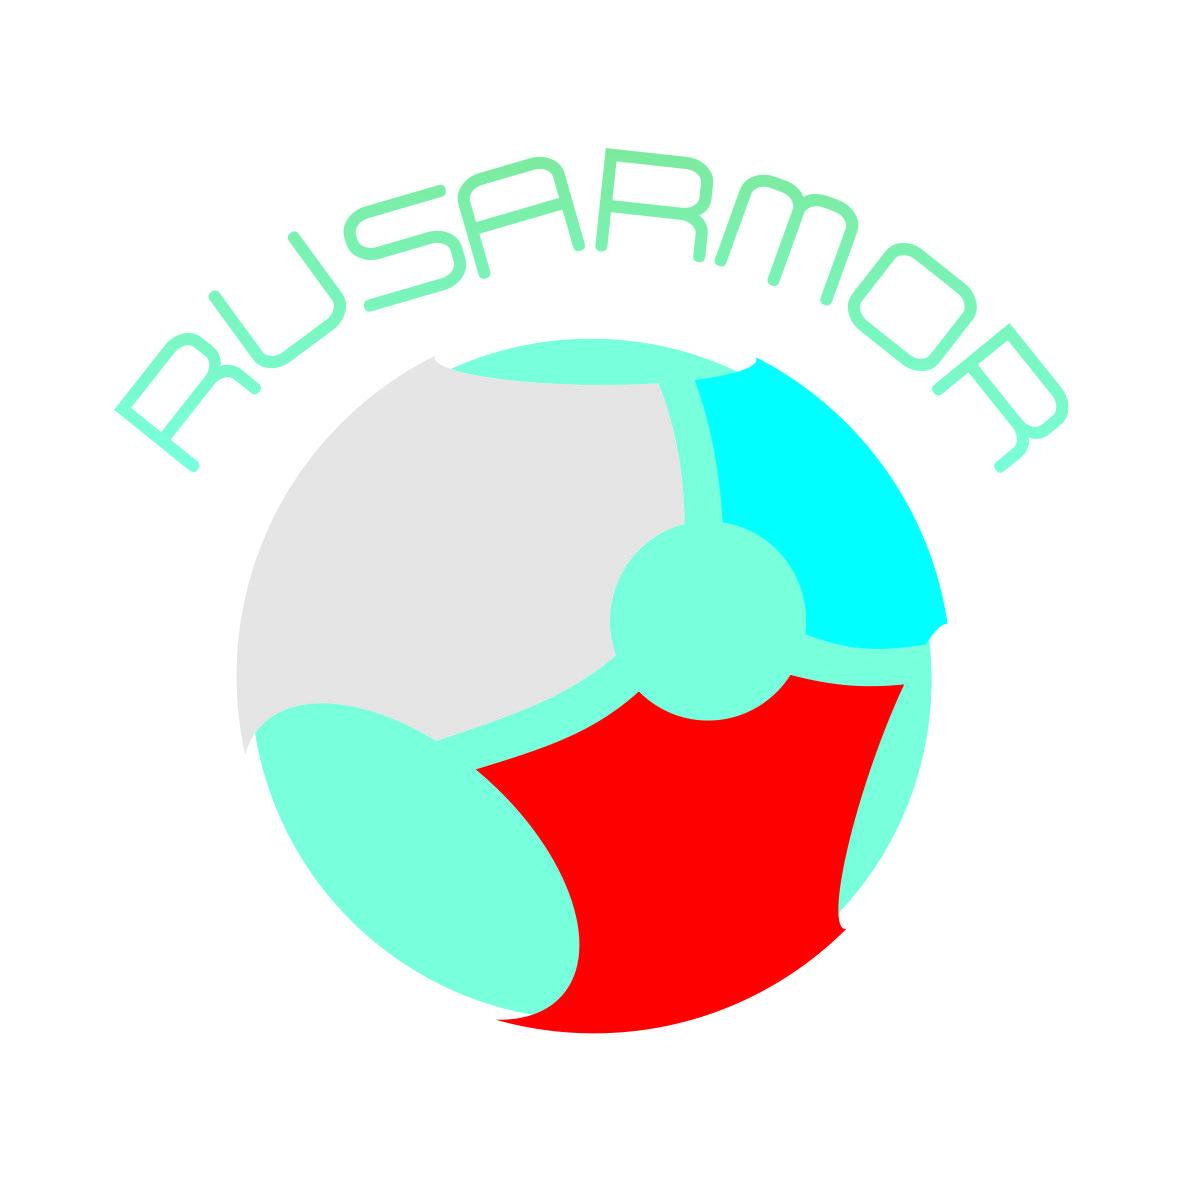 Разработка логотипа технологического стартапа РУСАРМОР фото f_8815a090176bdbcb.jpg